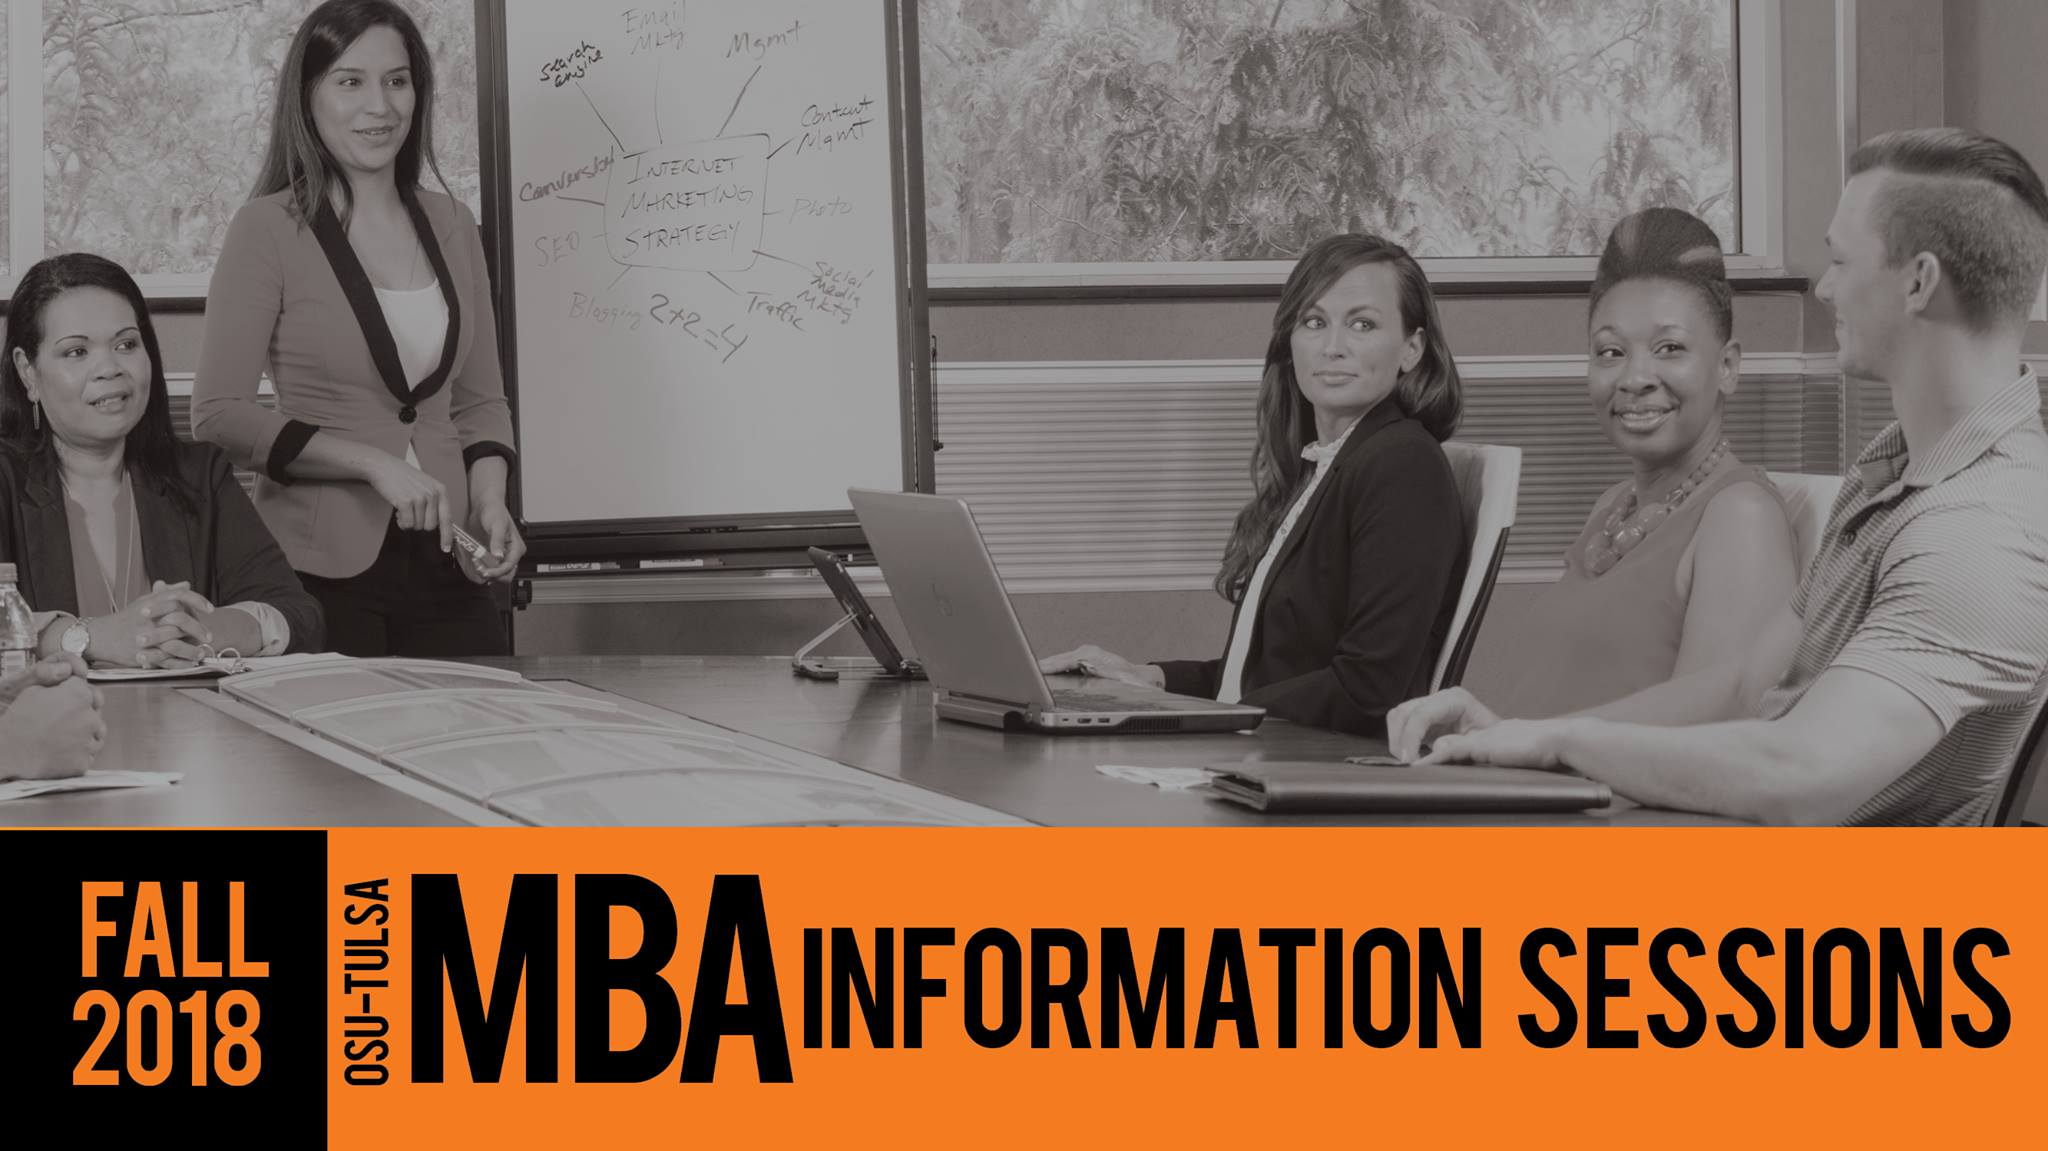 Fall 2018 OSU-Tulsa MBA Information Sessions